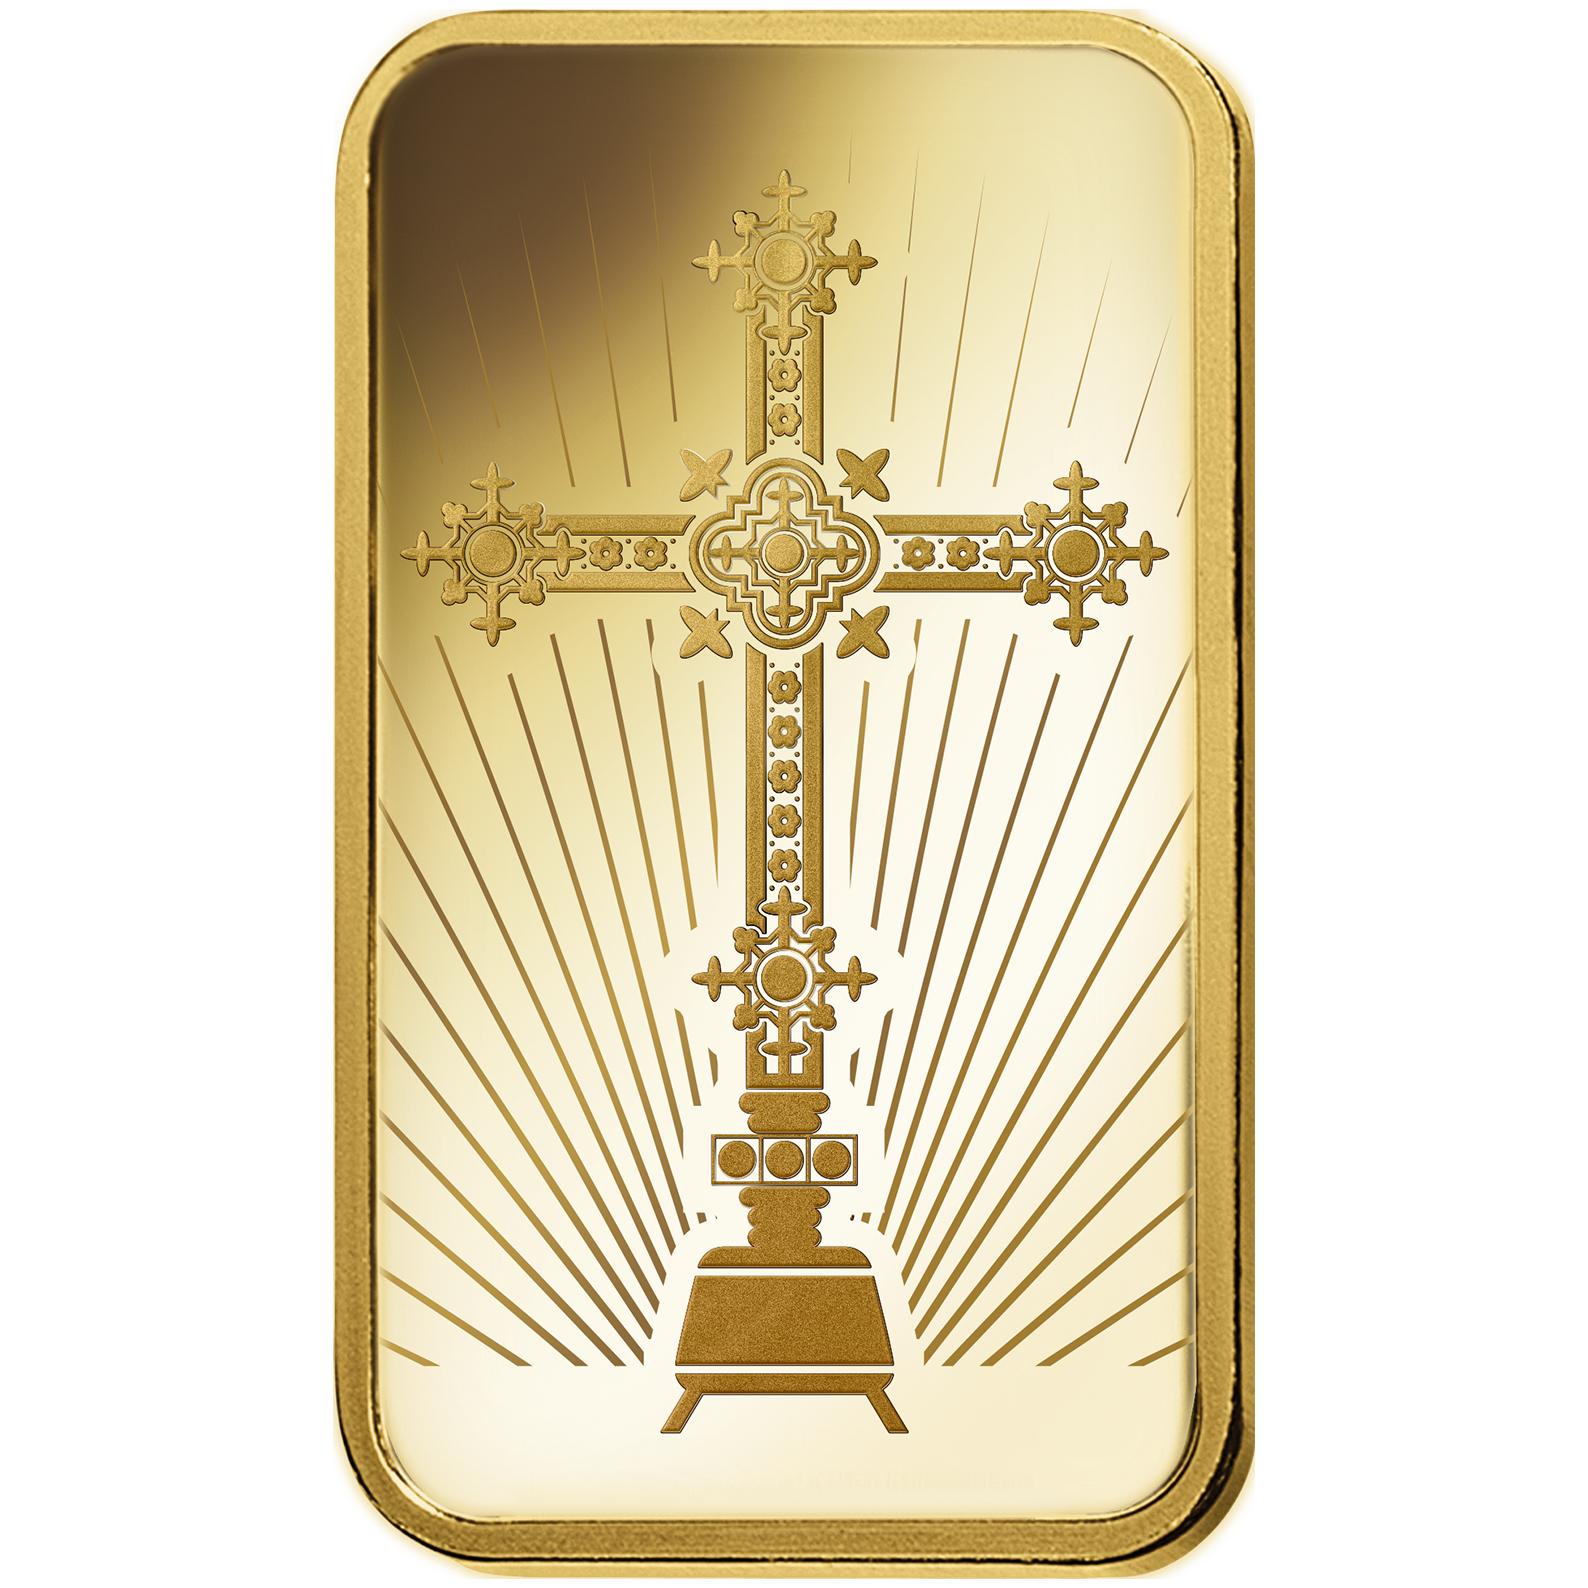 1 oncia lingottino d'oro puro 999.9 - PAMP Suisse Croce Romana